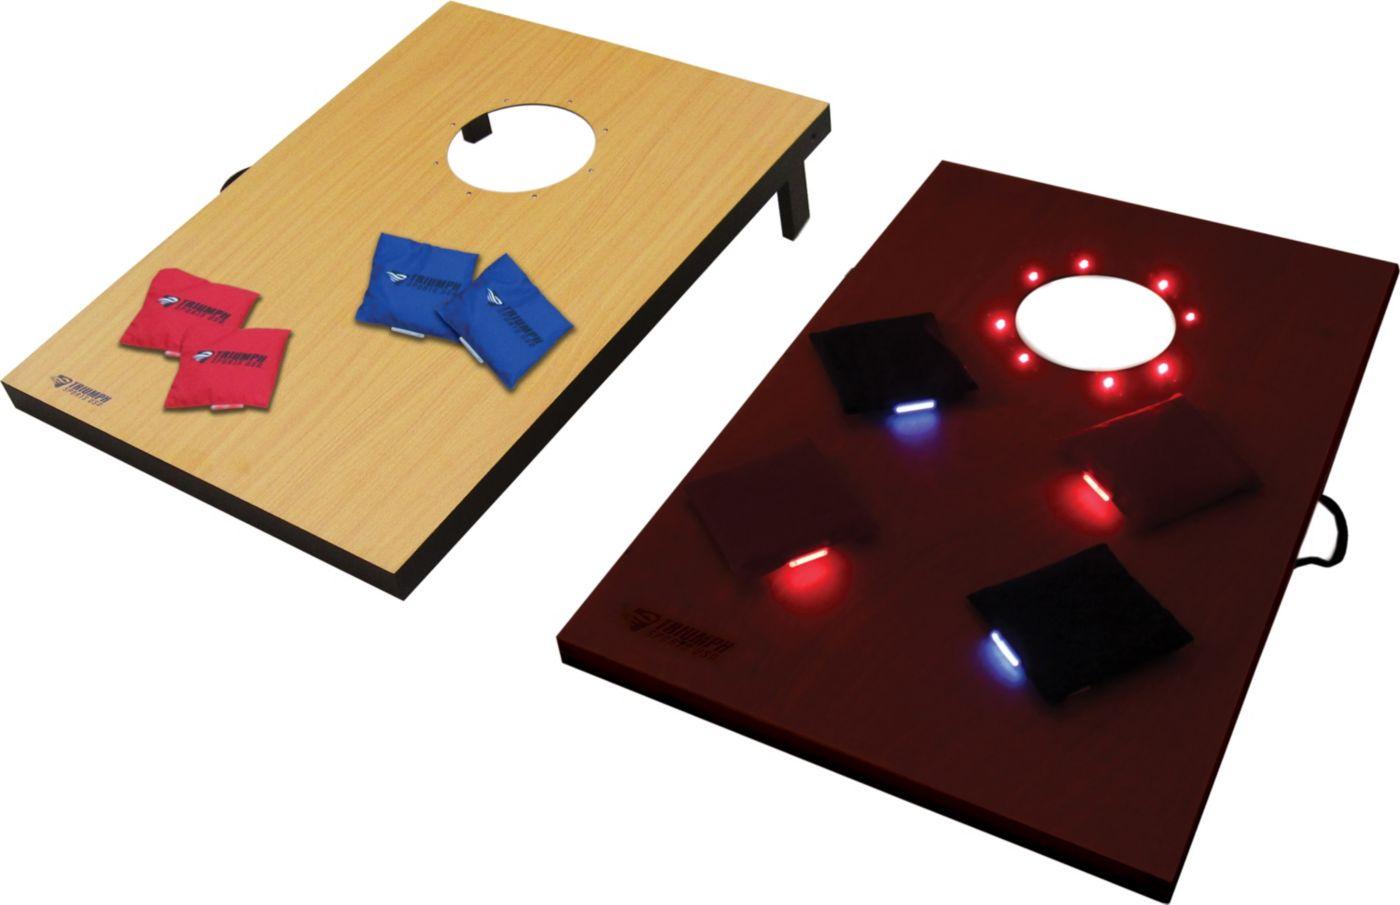 Triumph LED Lighted Tournament Bag Toss Game Set